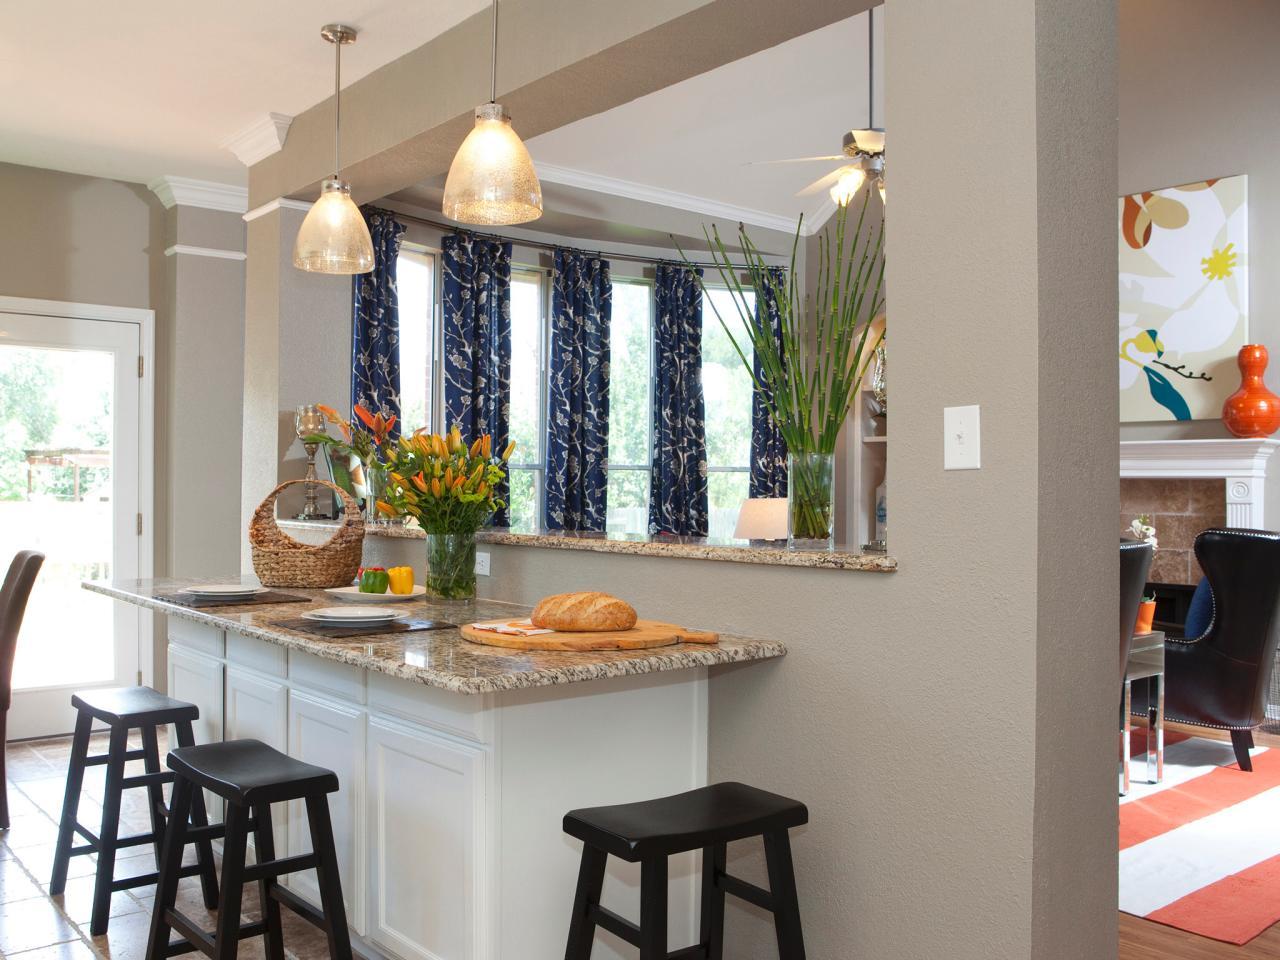 bp_hbuse-112_kitchen-efter-07_s4x3-jpg-rend-hgtvcom-1280-960